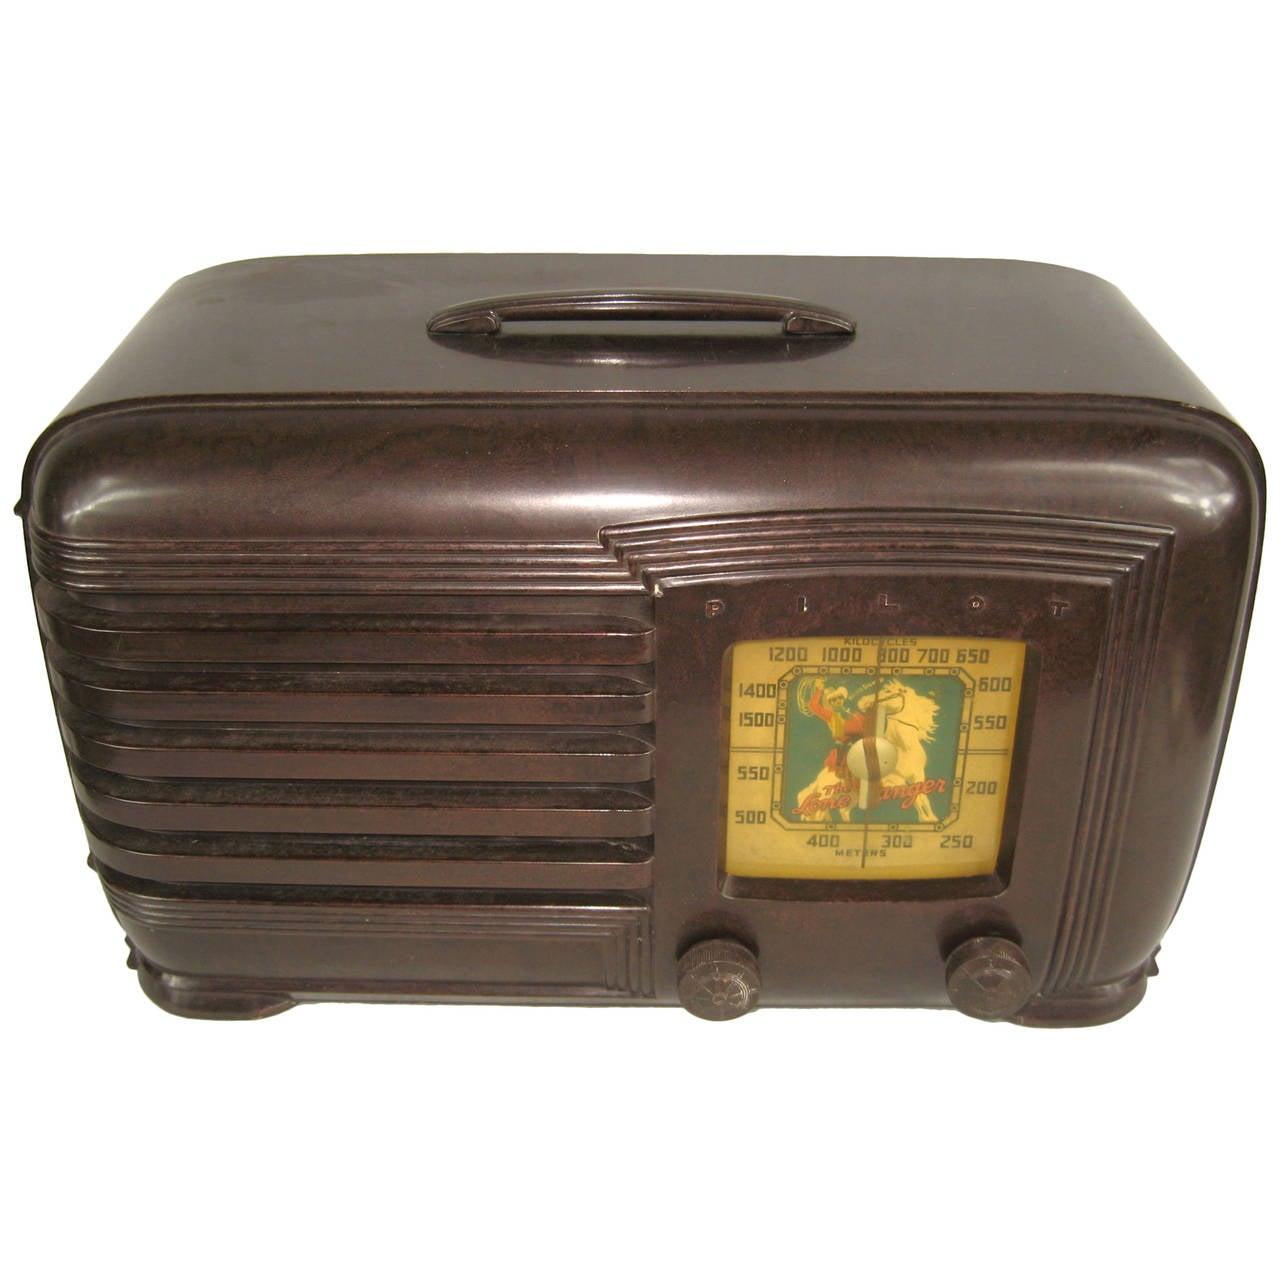 Lone ranger vintage 1930s pilot bakelite radio at 1stdibs for Furniture and more